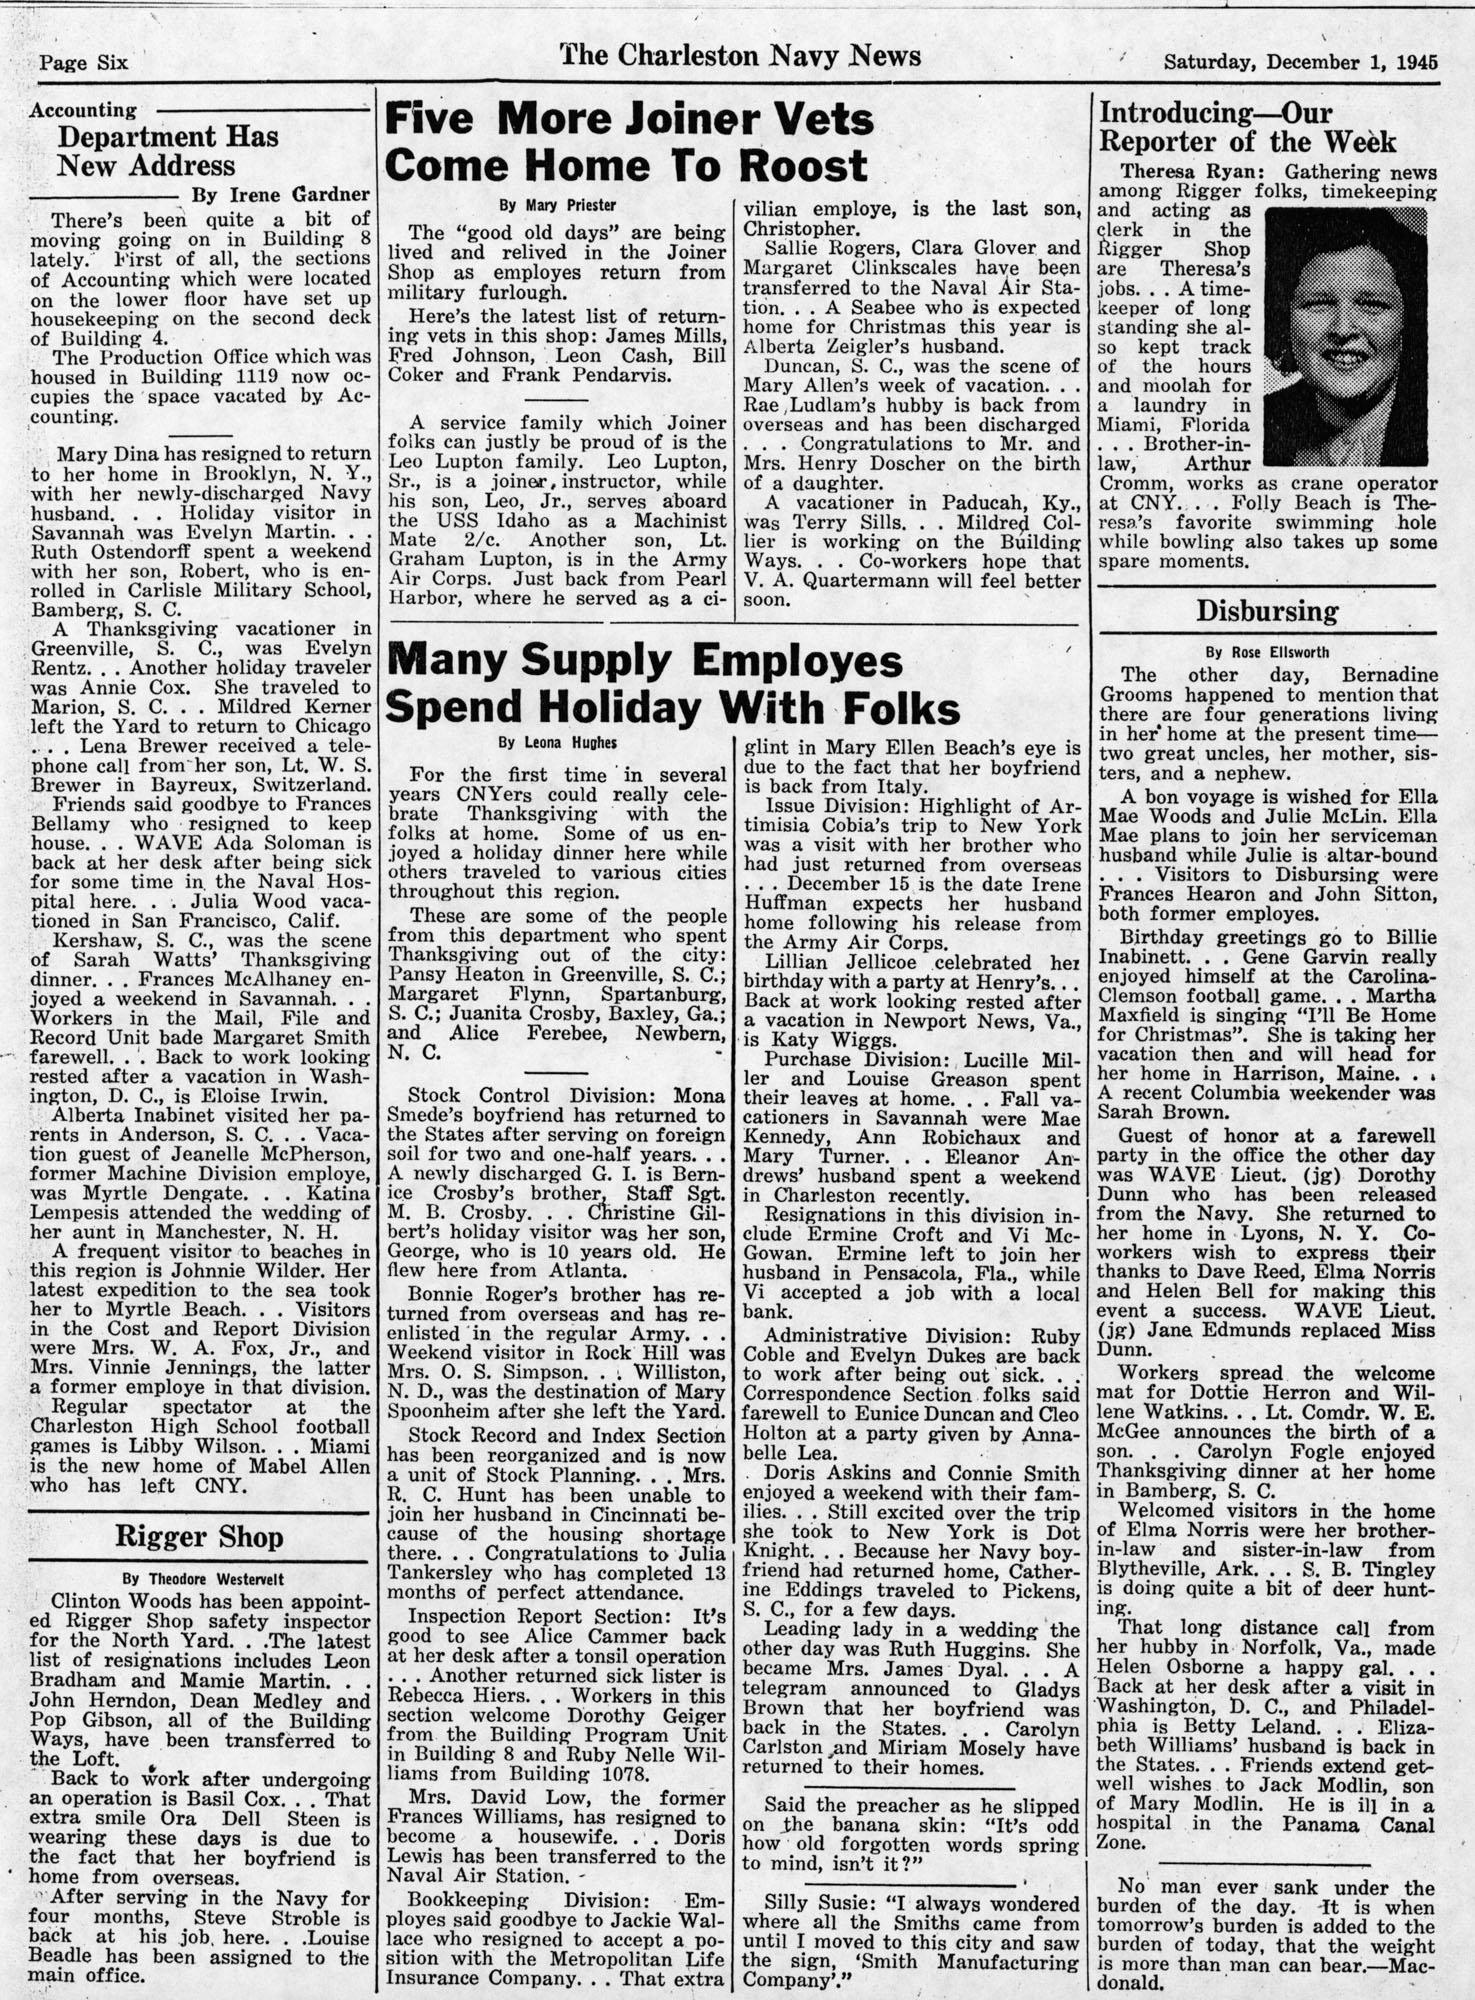 The Charleston Navy News, Volume 4, Edition 11, page vi